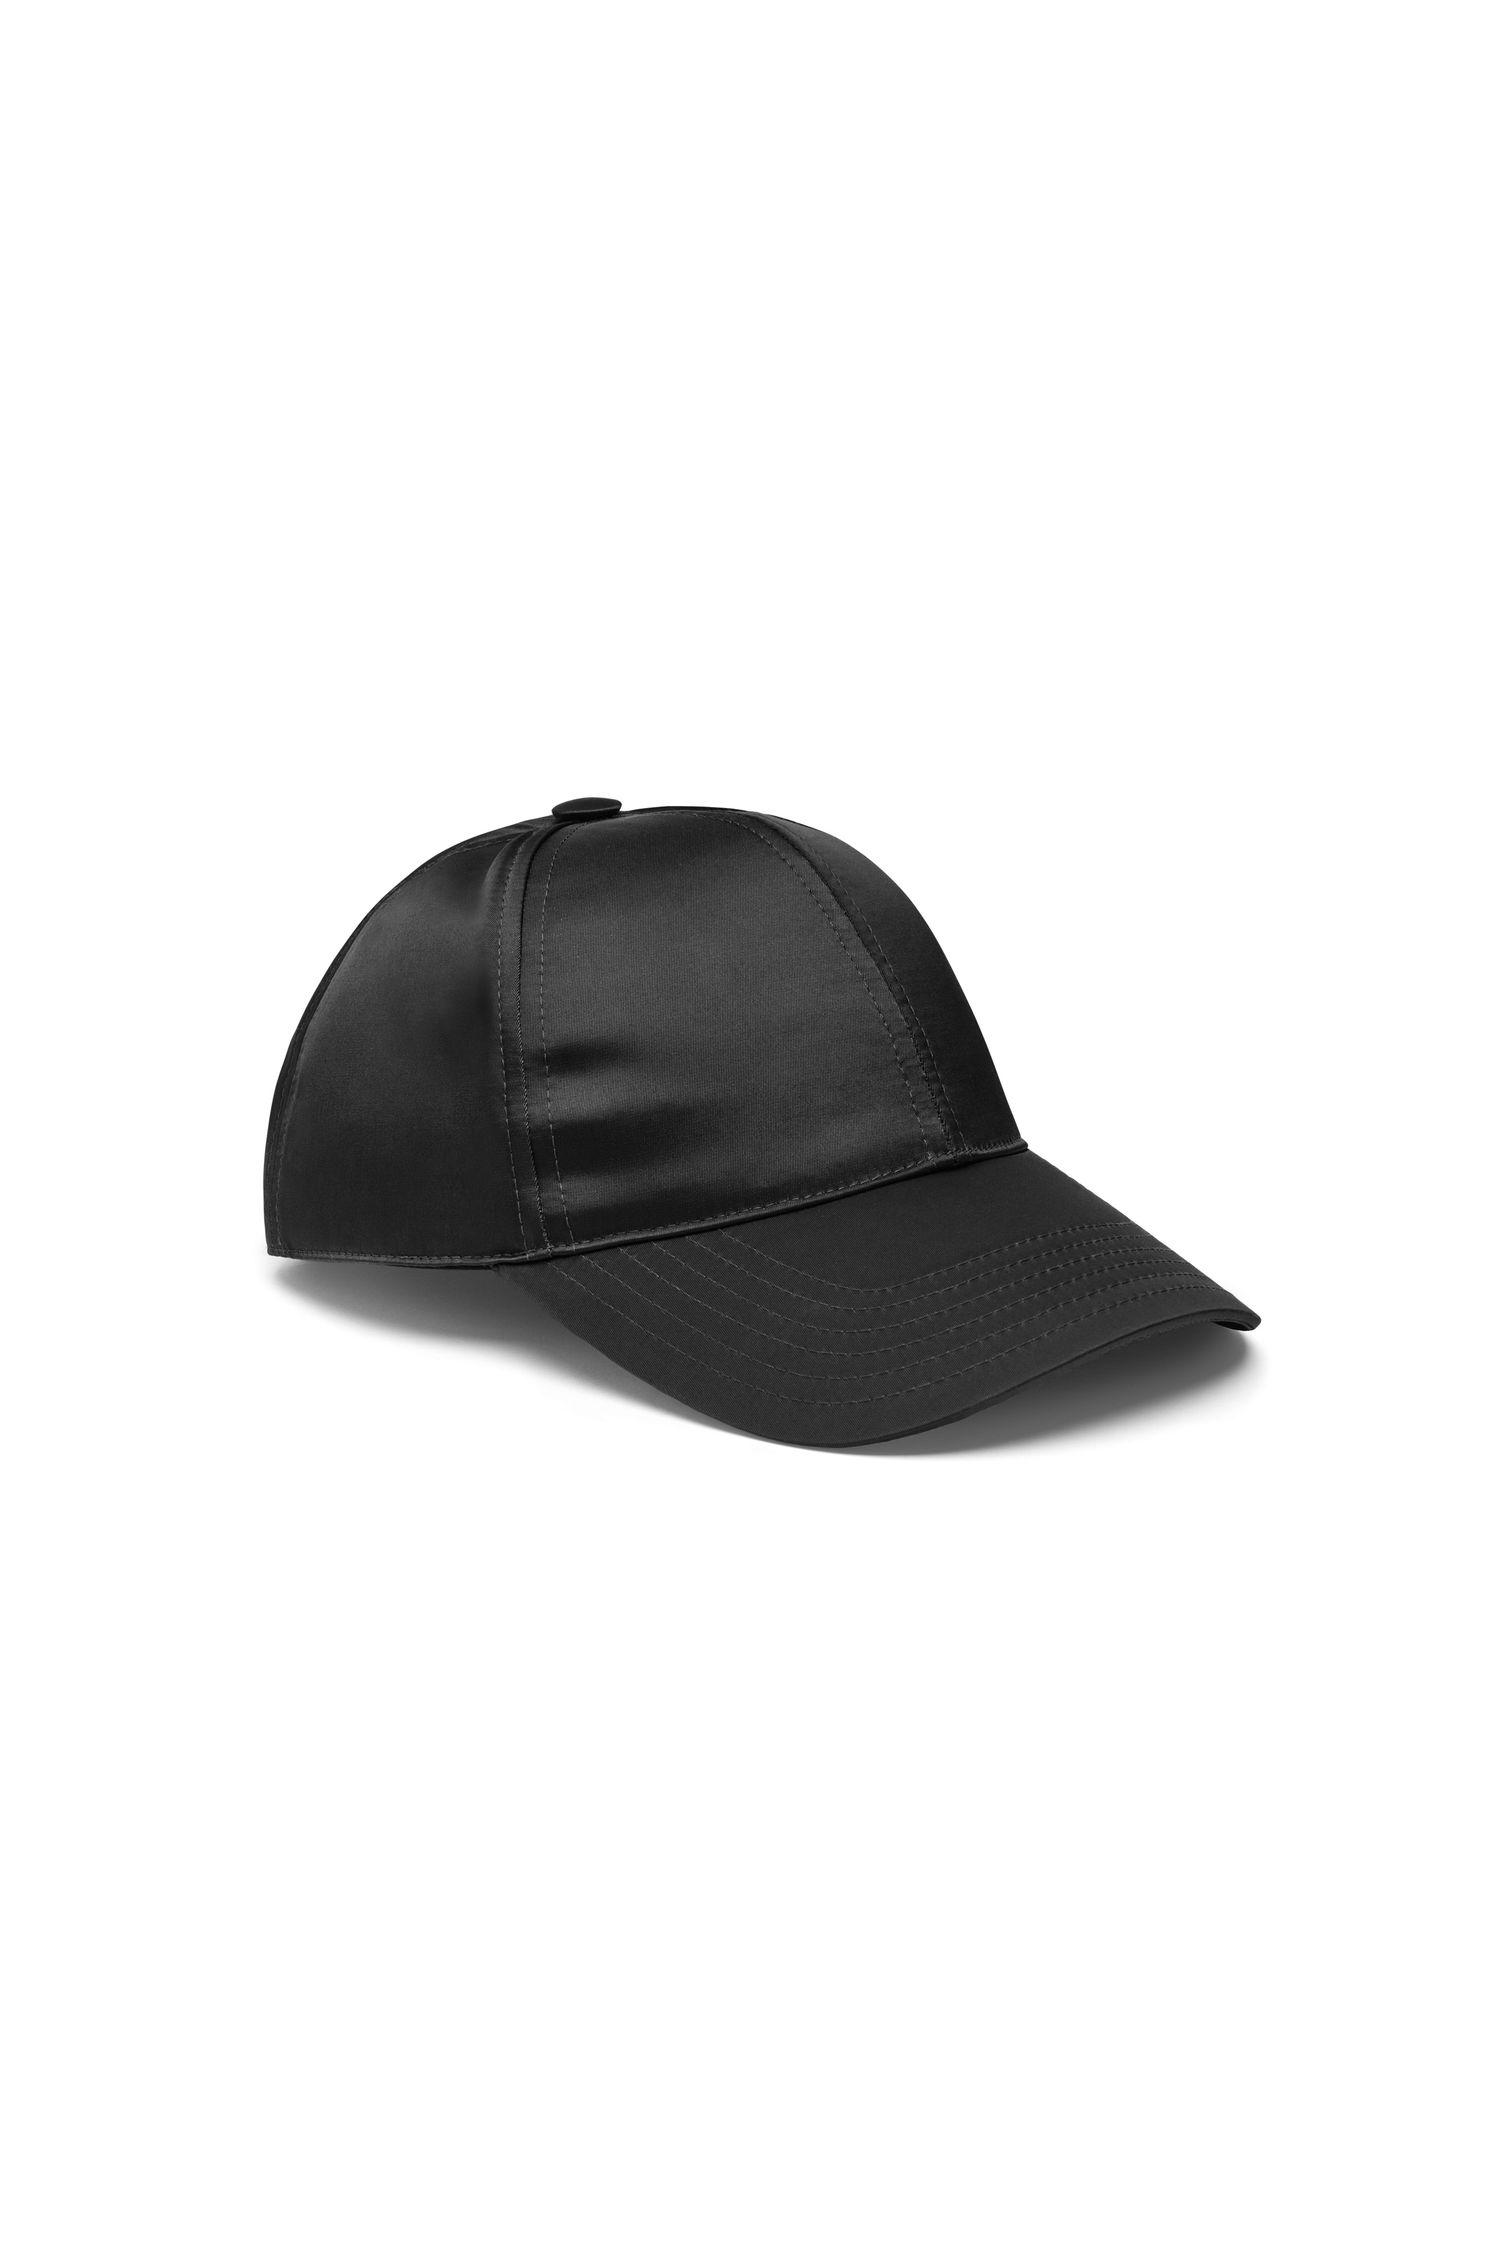 a9161fc9917 Acne Studios Camp Matt Face-AppliquÉ Cap In Black